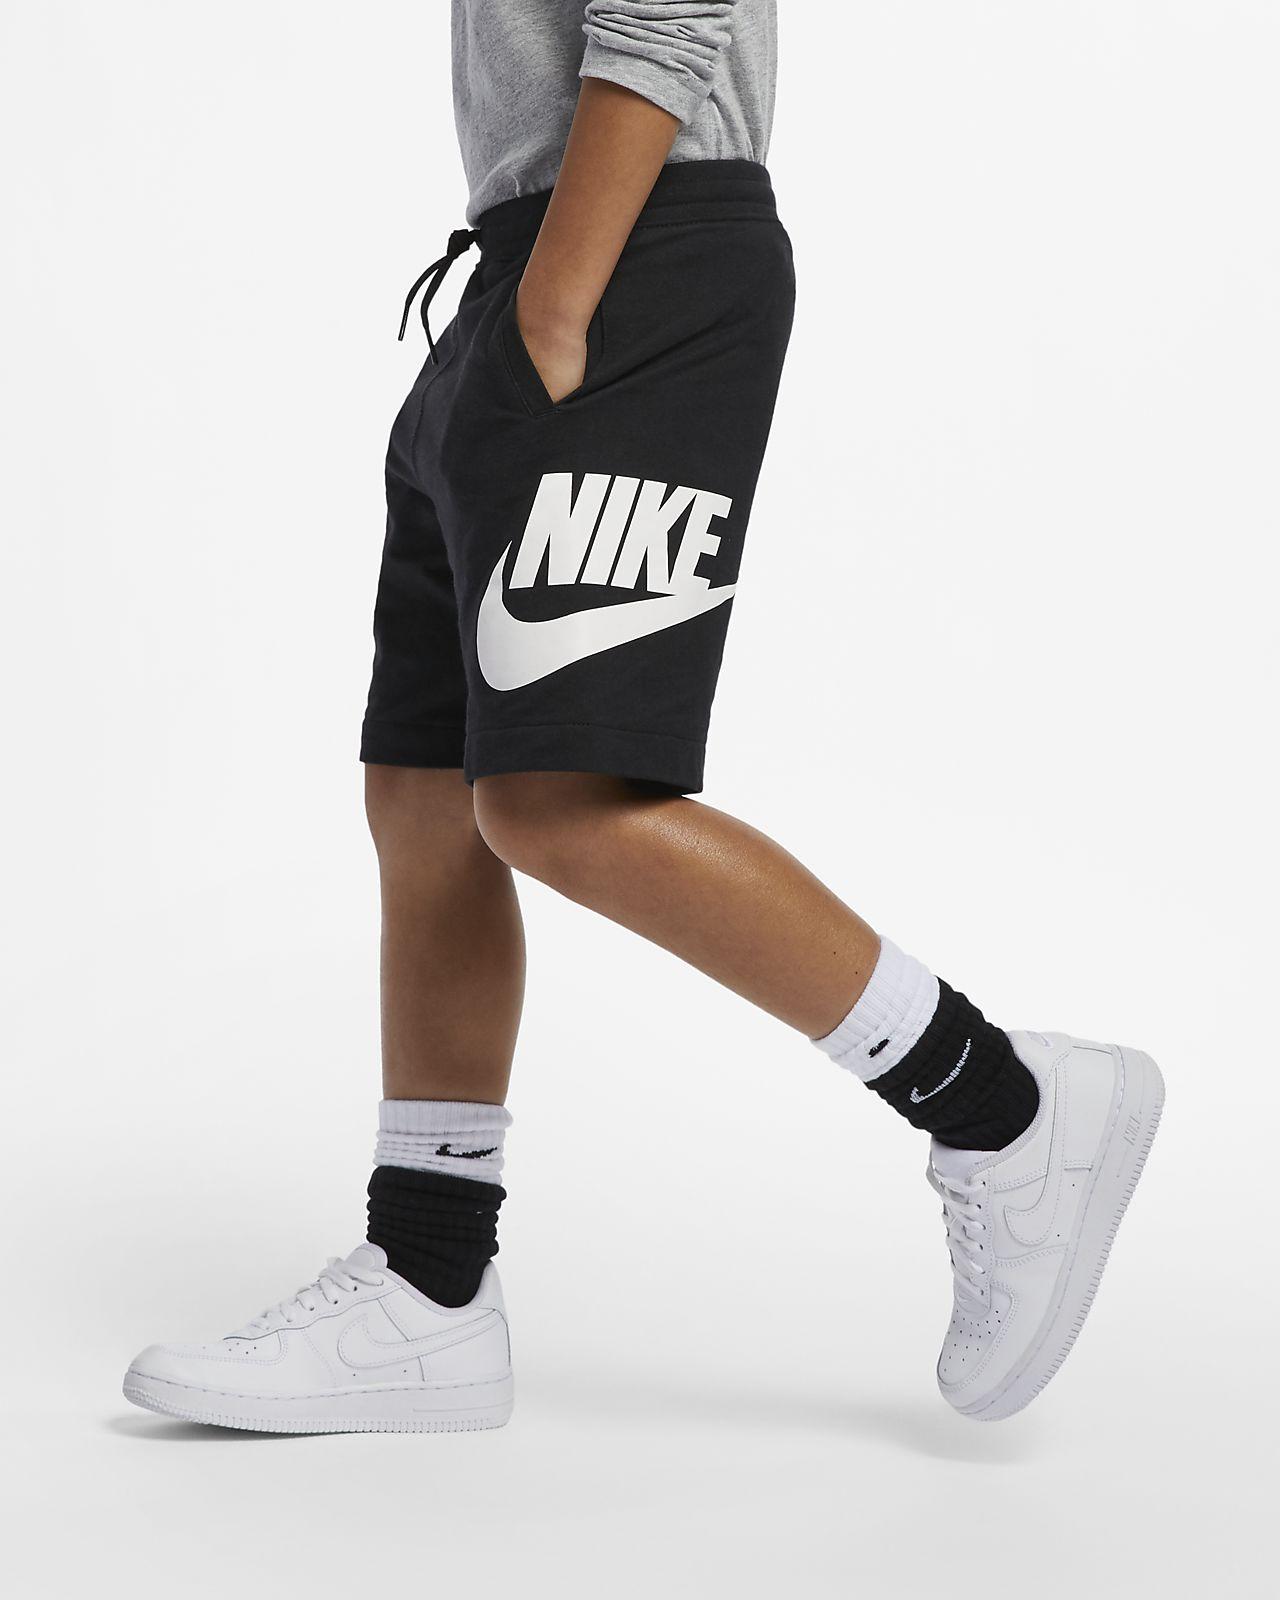 Nike Sportswear Alumni rövidnadrág kisebb gyerekeknek